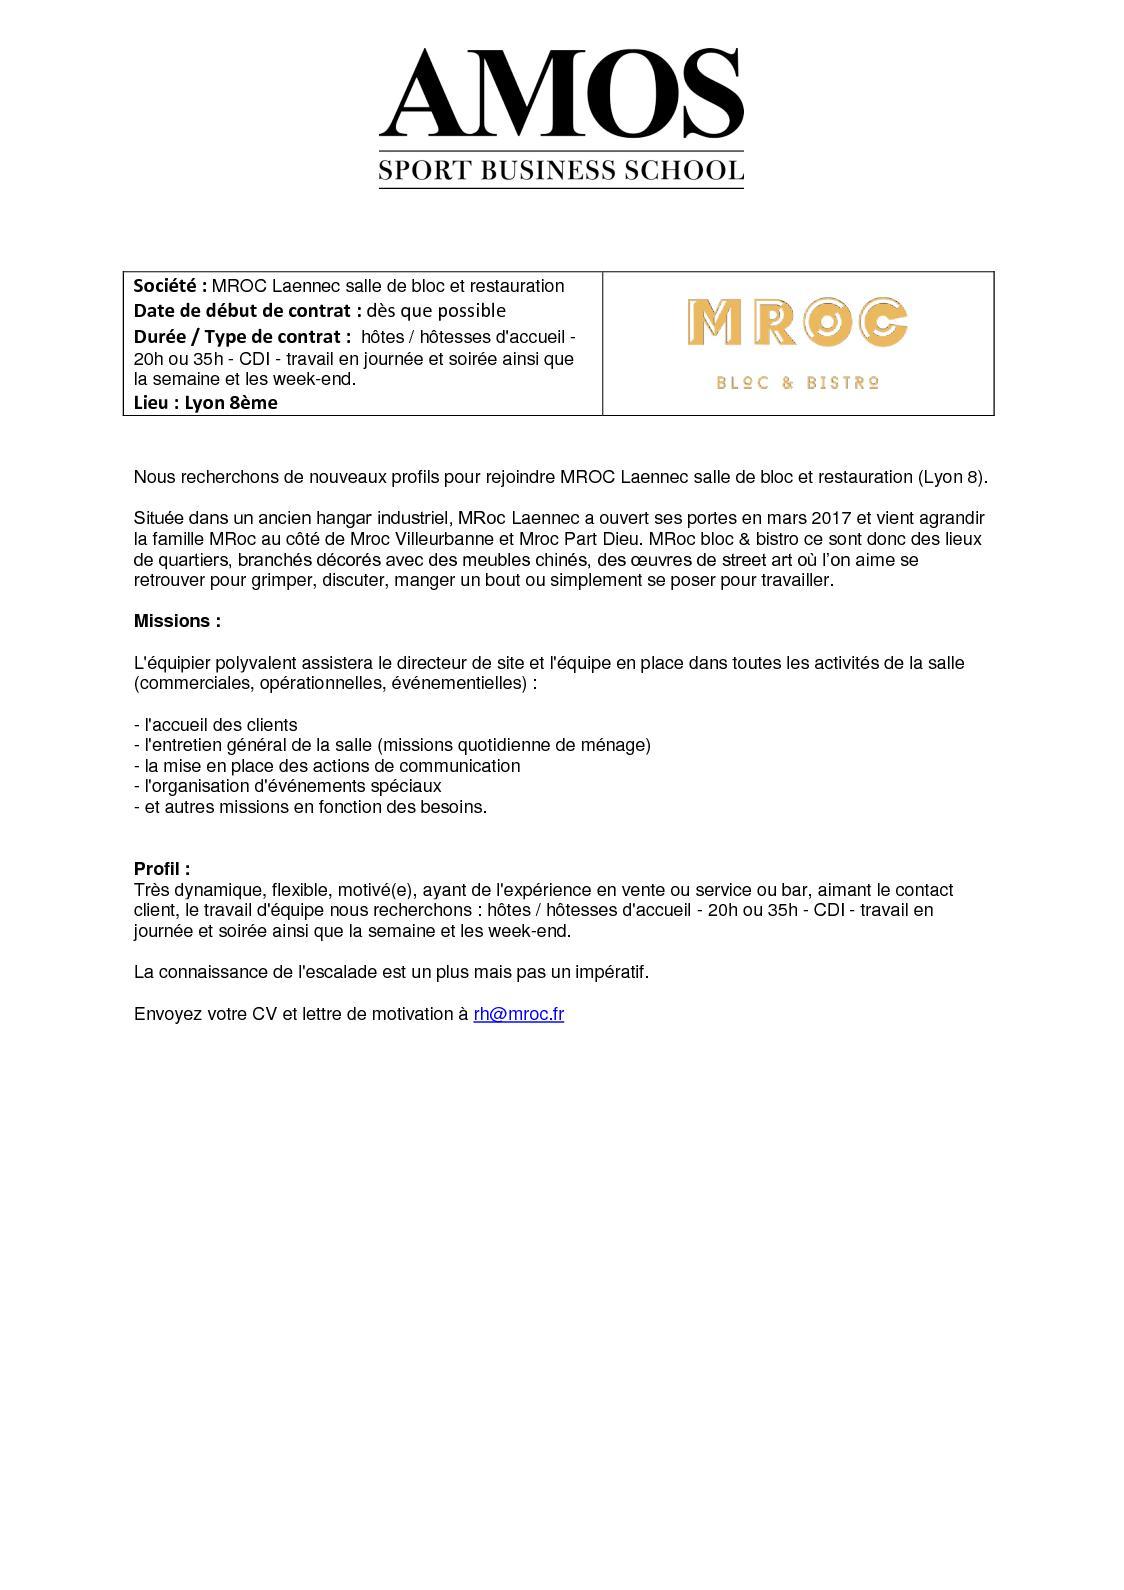 Calameo 270418 Offre D Emploi Mroc Laennec